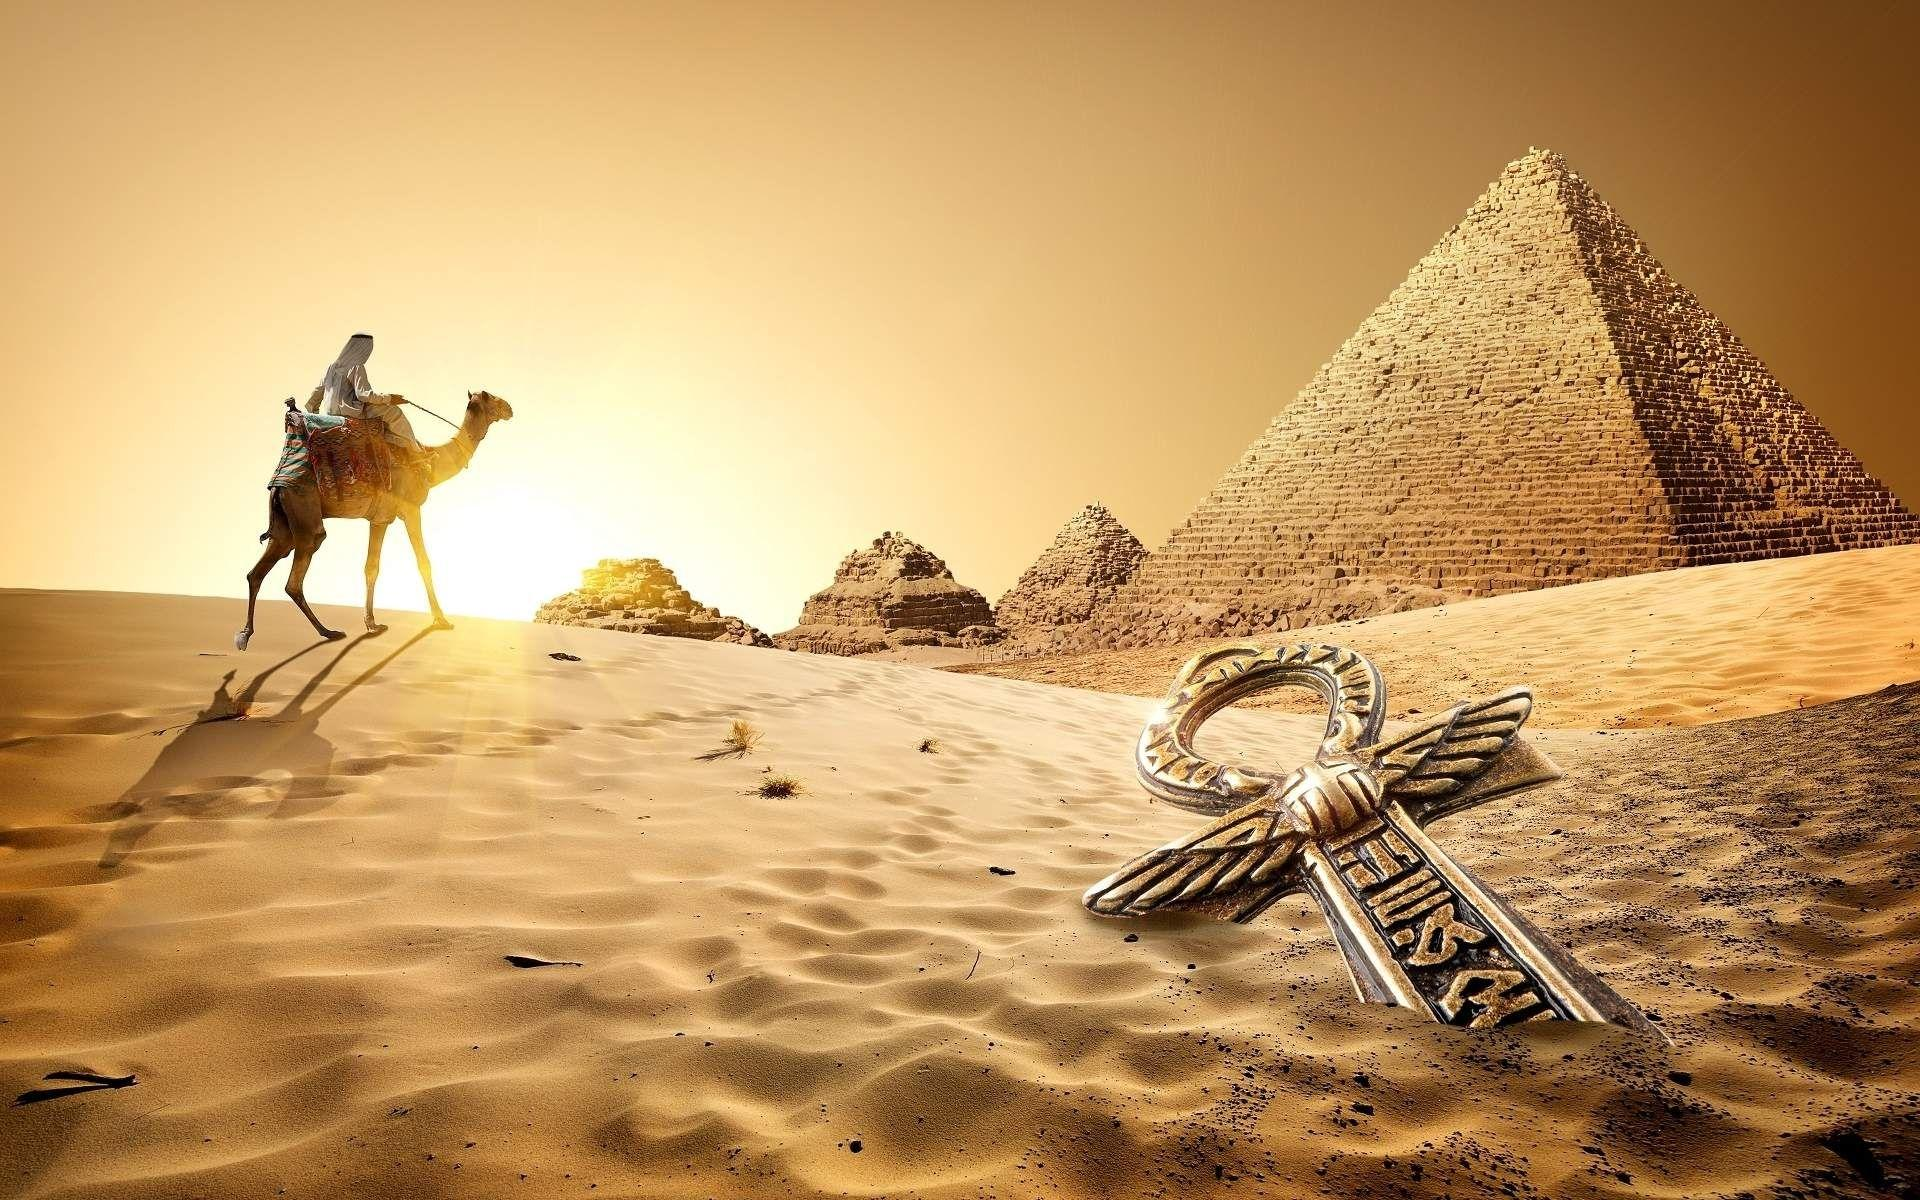 Egypt Desktop Wallpapers - Wallpaper Cave